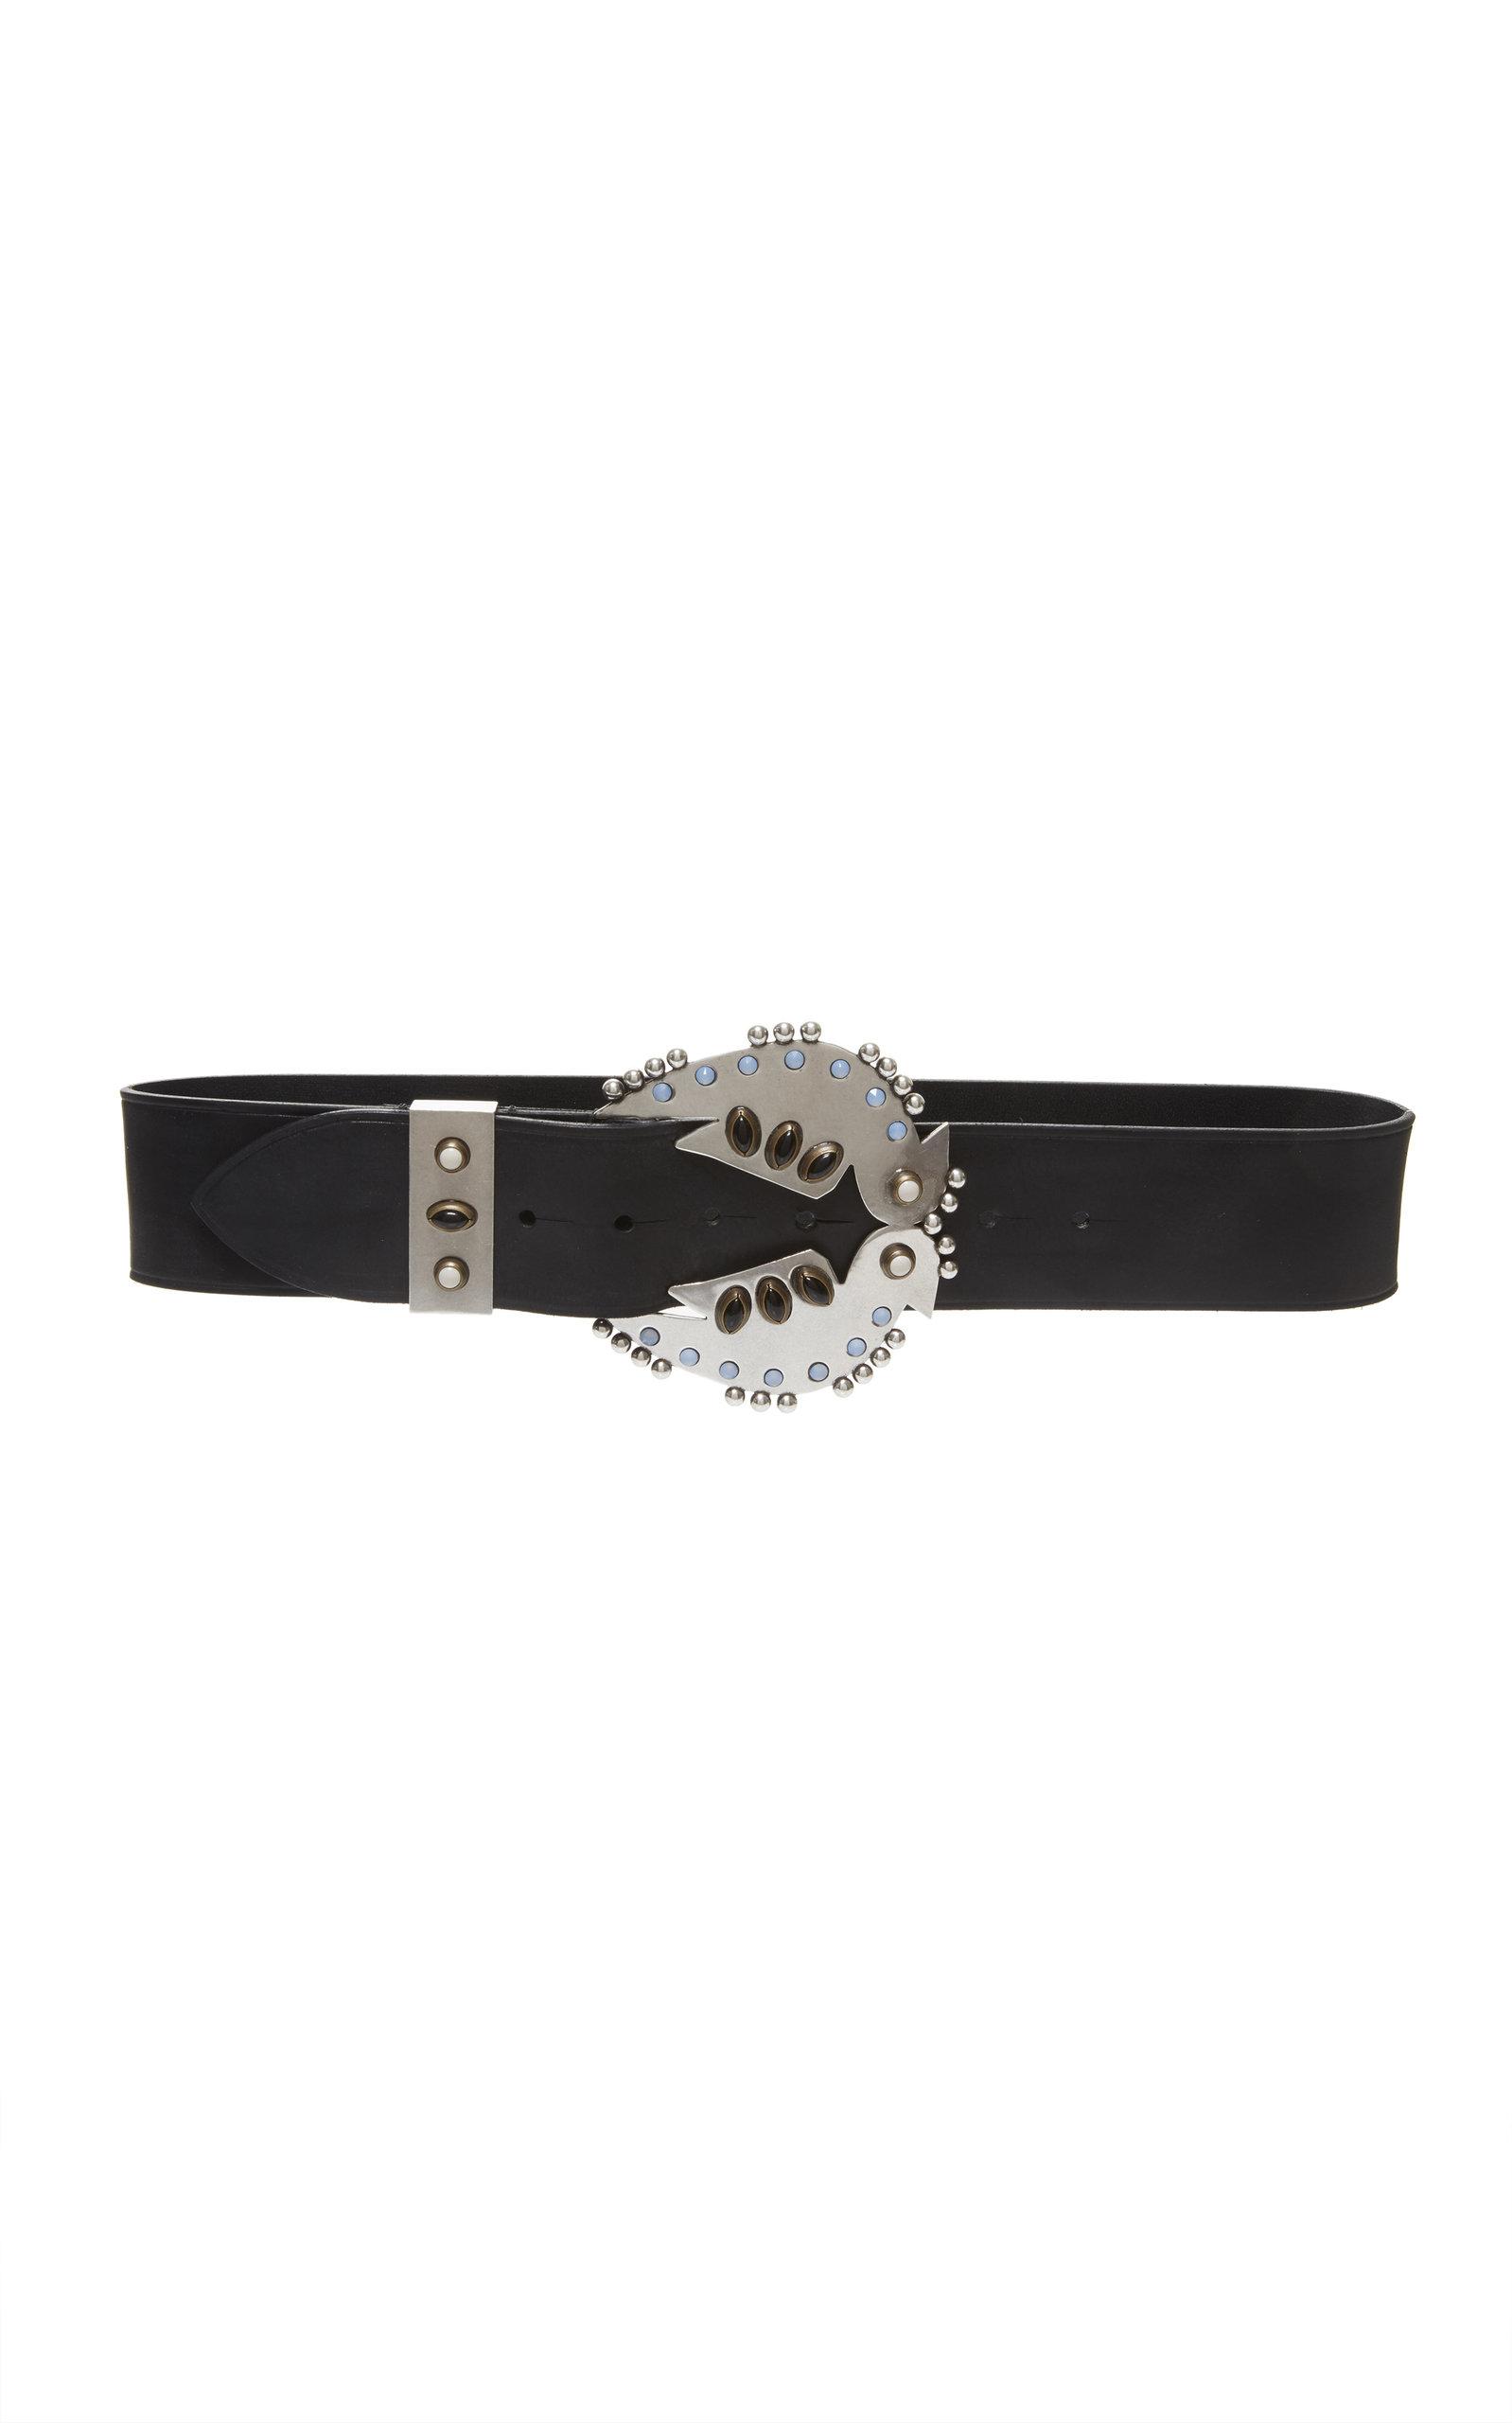 Isabel Marant Belts Abigail Studded Leather Belt